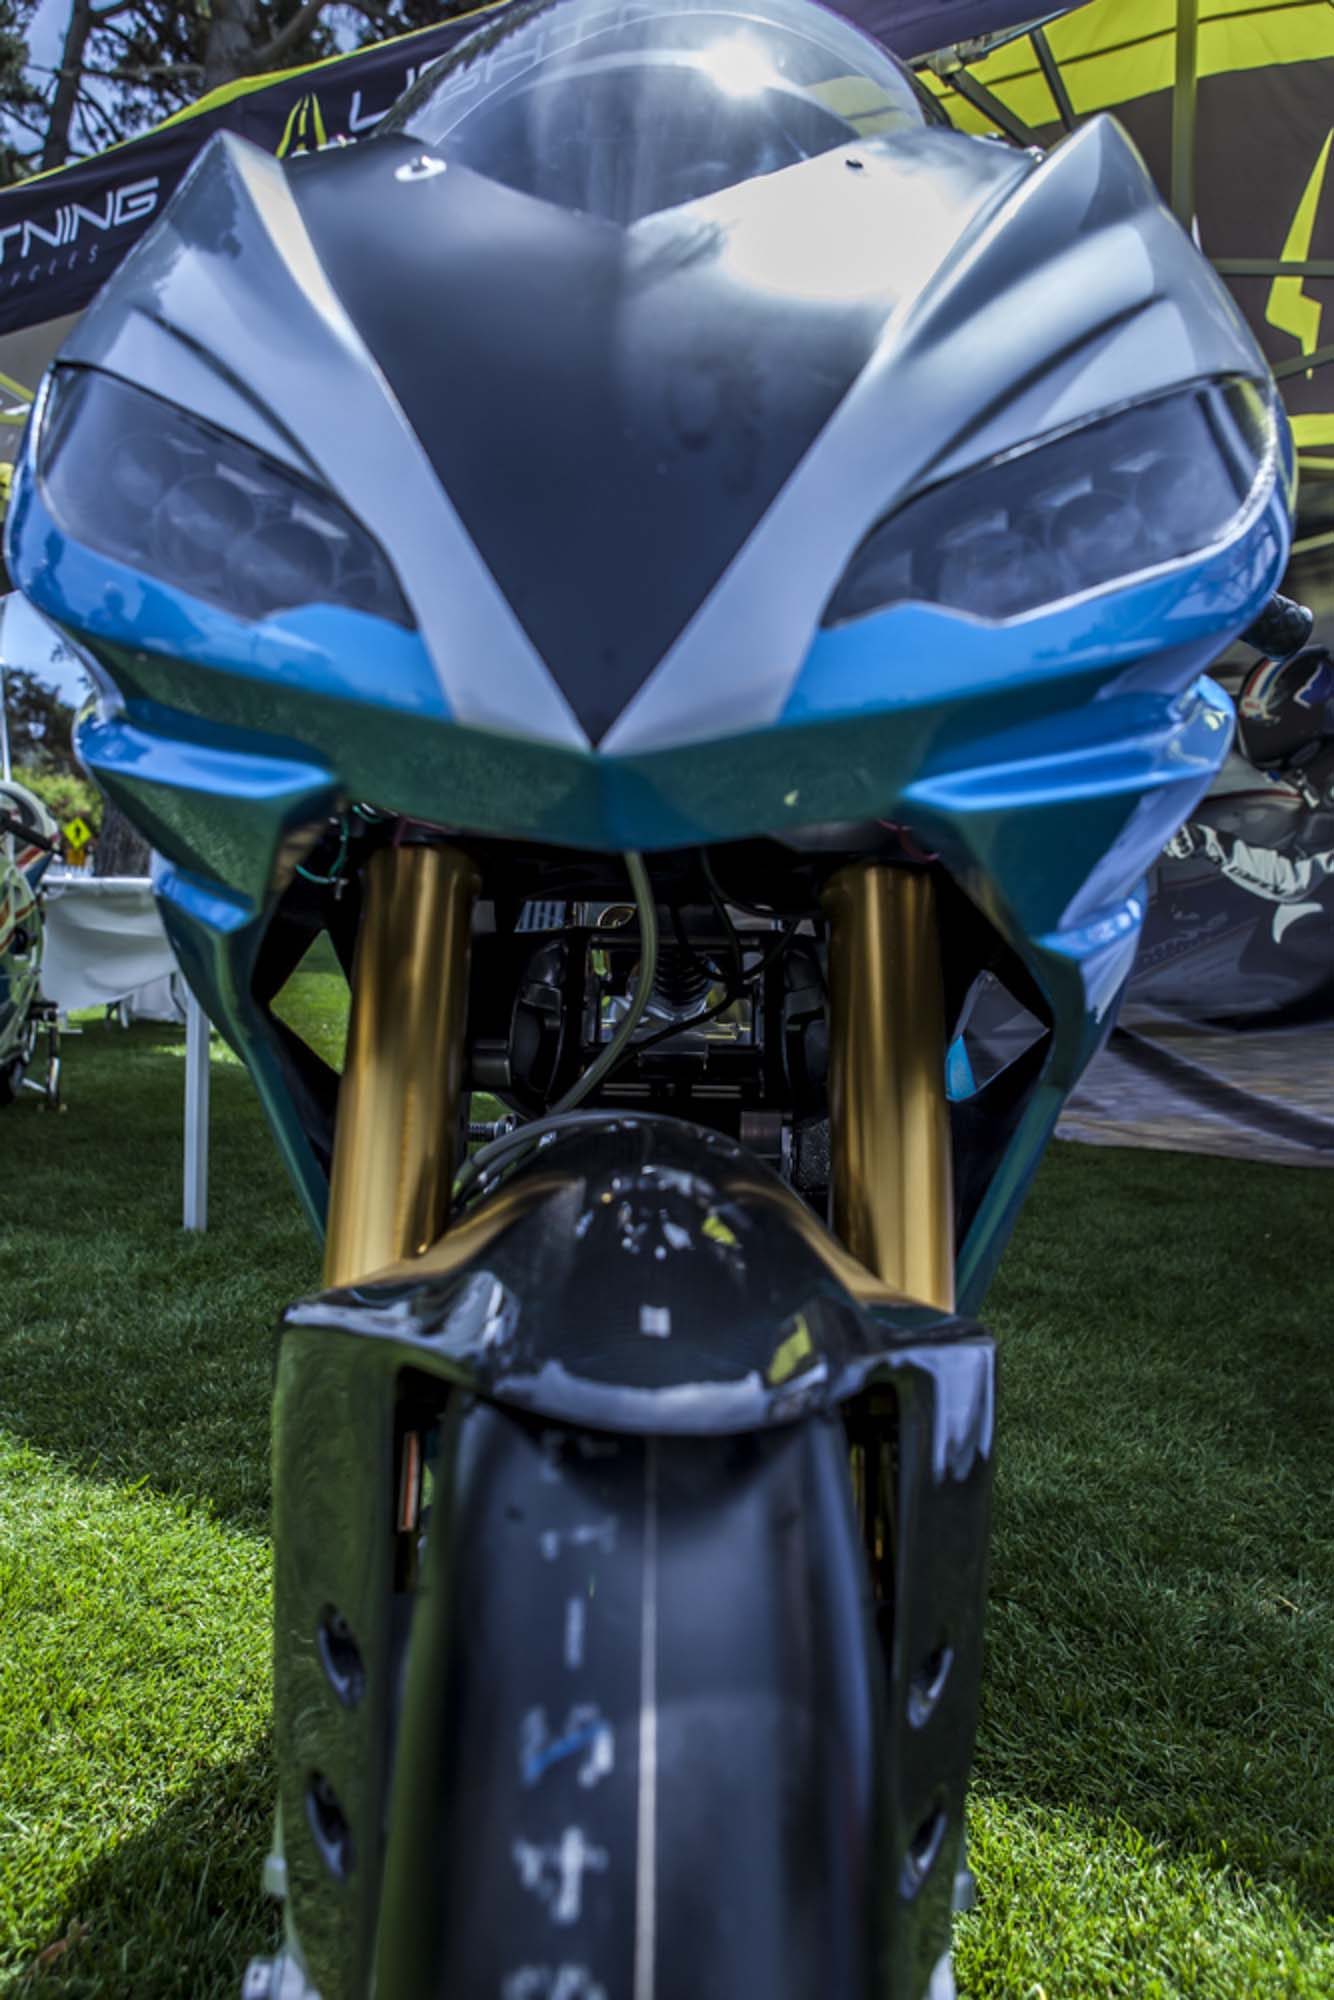 La sportive verte du futur - Page 15 Lightning-Motorcycles-LS-218-Quail-Lodge-Bryan-Delohery-03